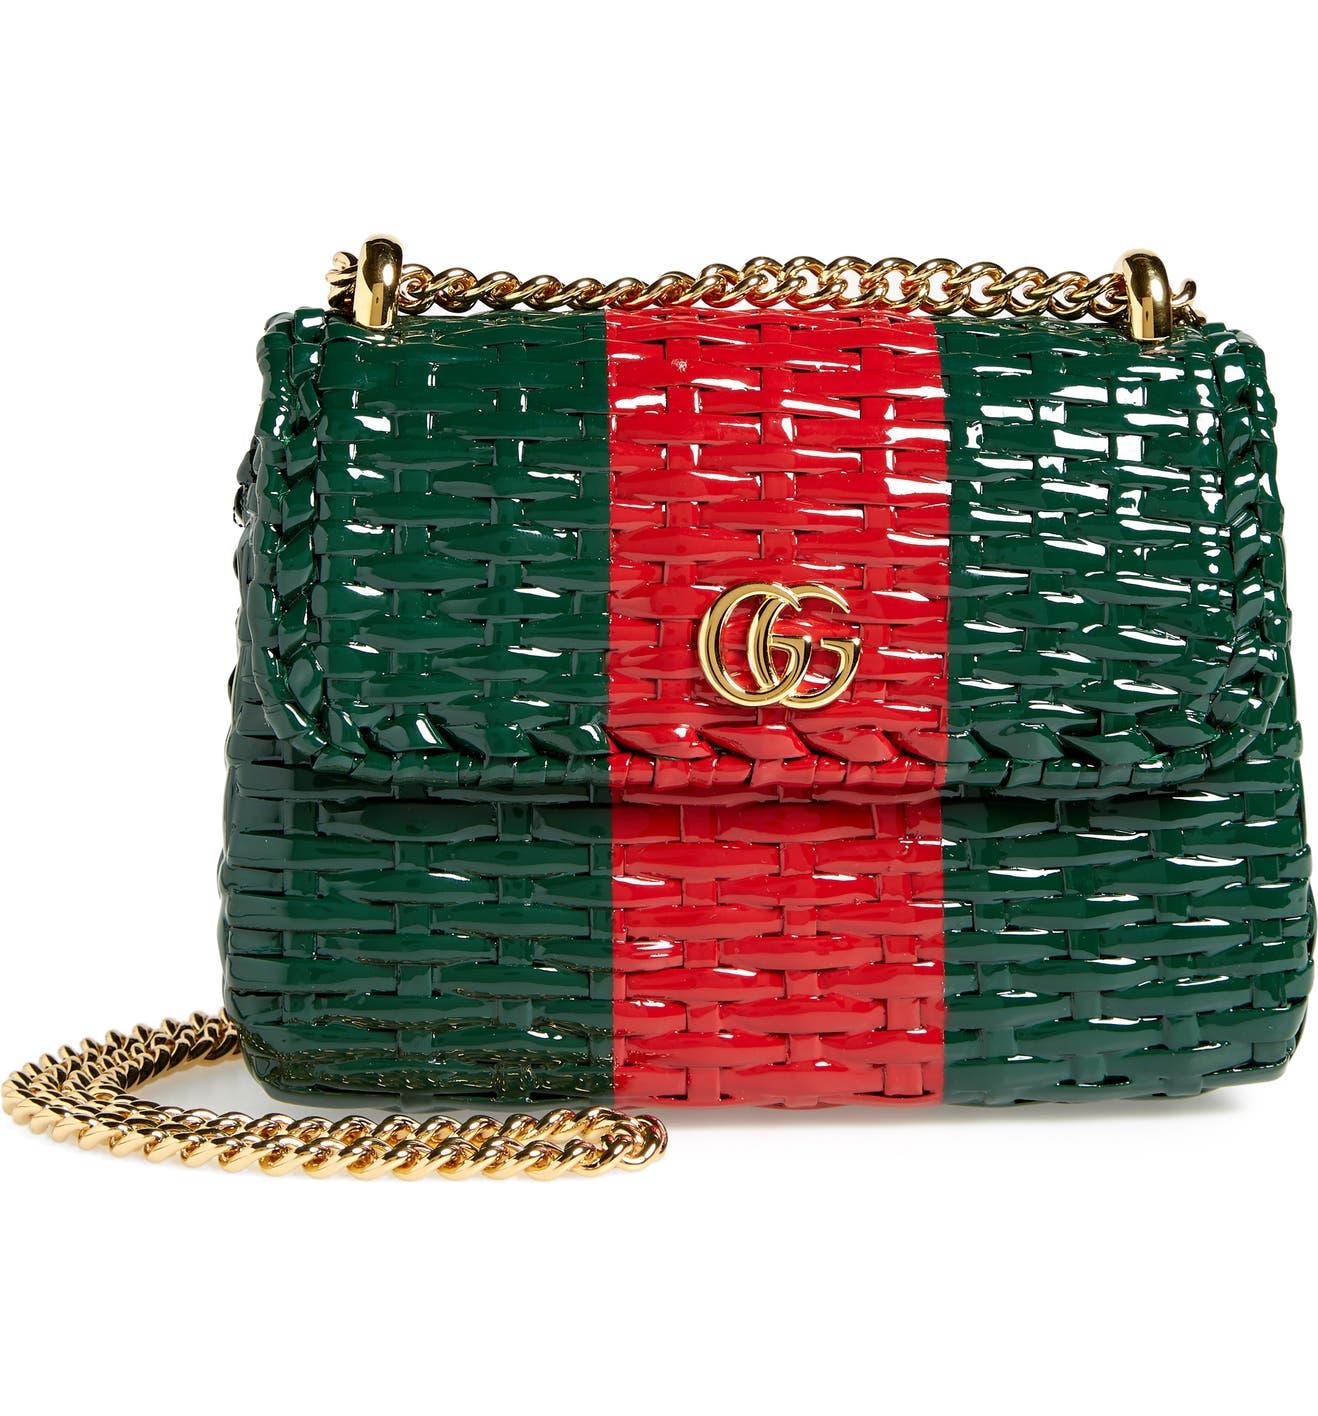 bae92edbb1ef65 Gucci Small Linea Cestino Glazed Wicker Shoulder Bag | Nordstrom